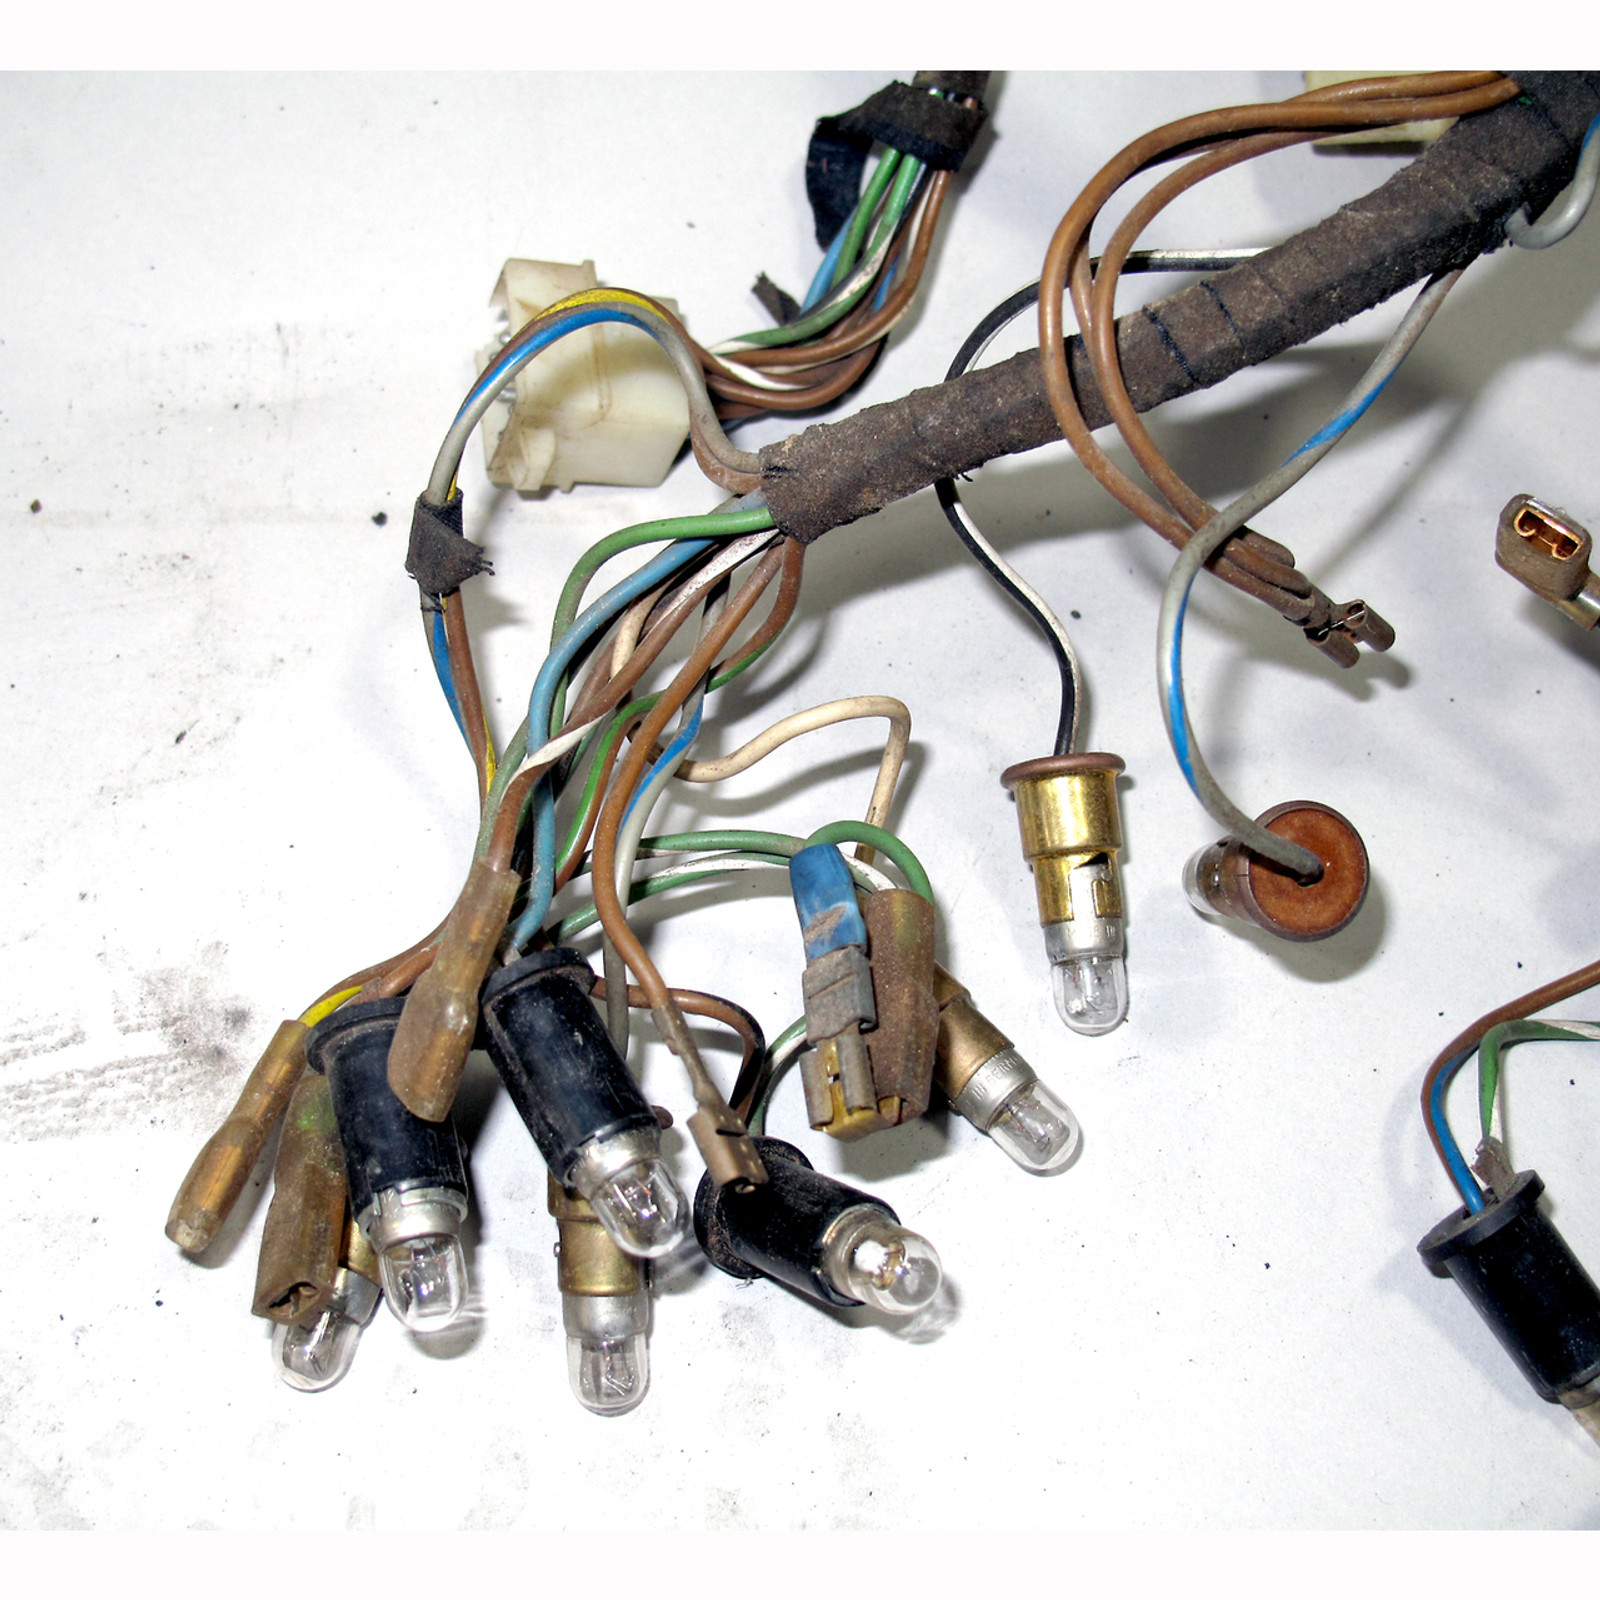 wiring diagram 1974 bmw cs wiring diagram online BMW N52 DME Wiring Diagrams